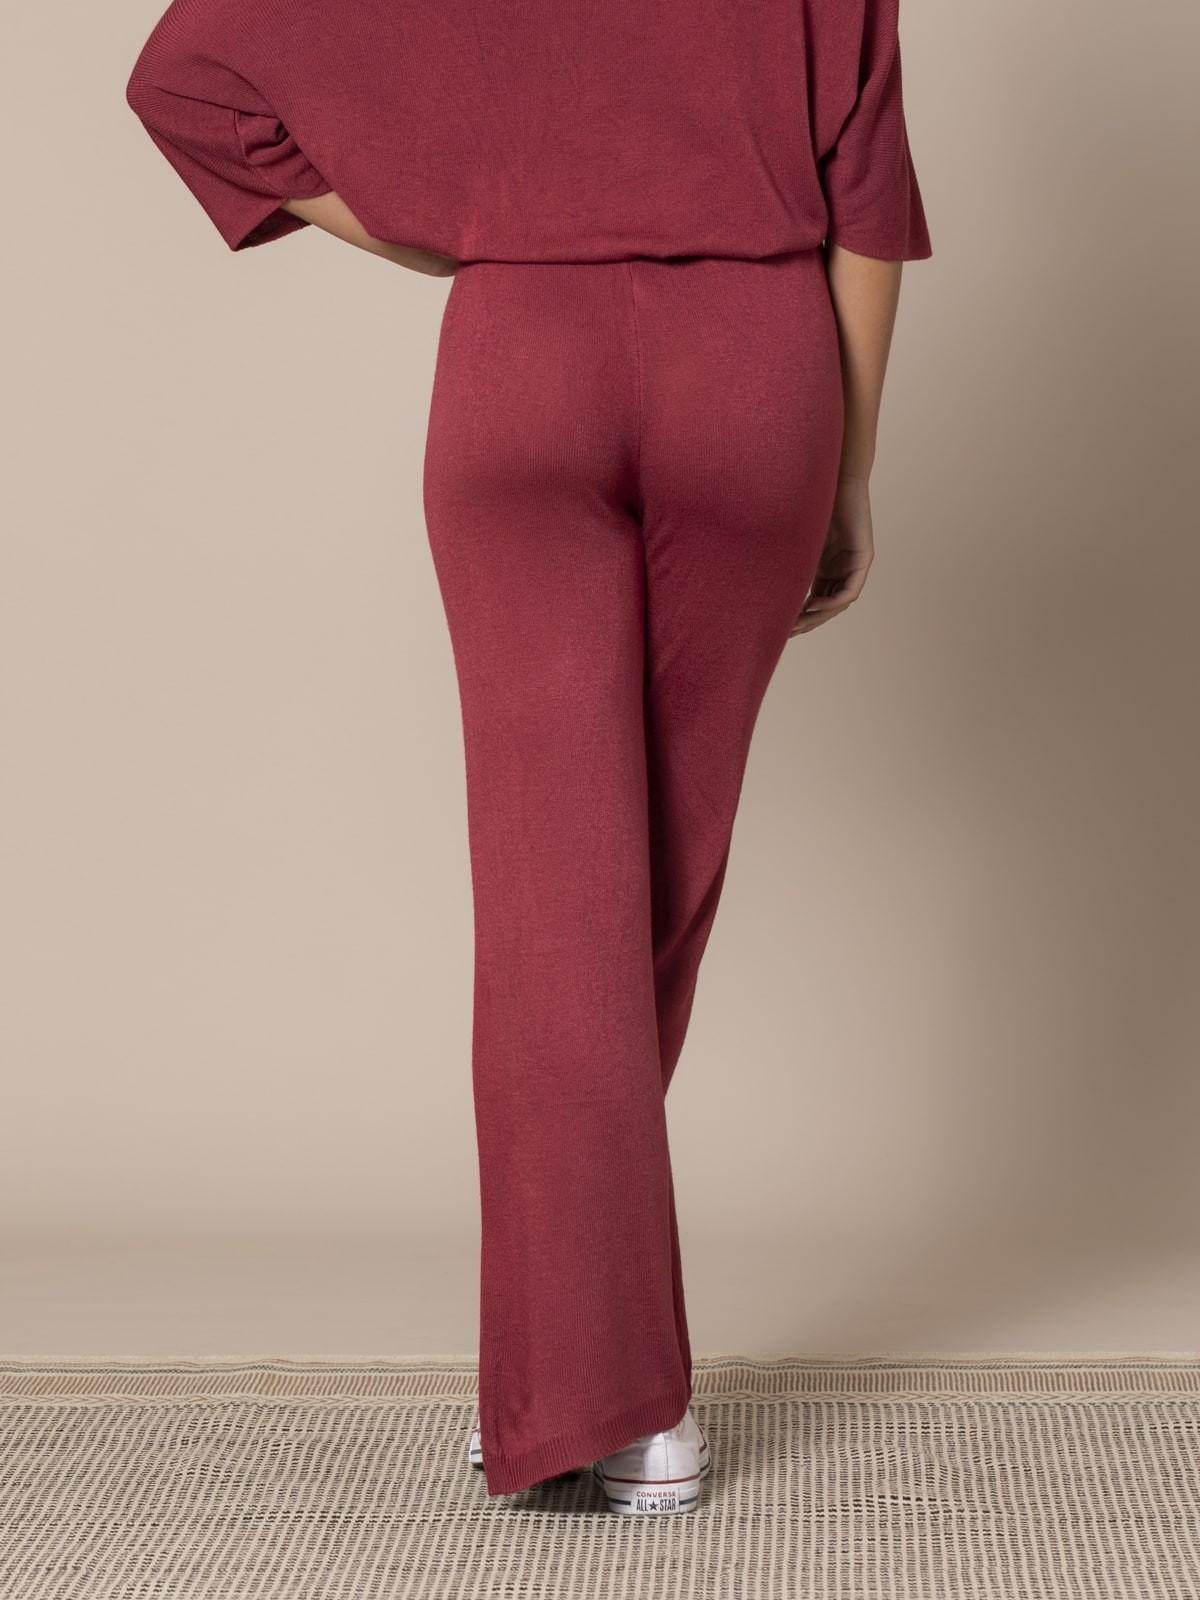 Pantalón mujer de punto Granate